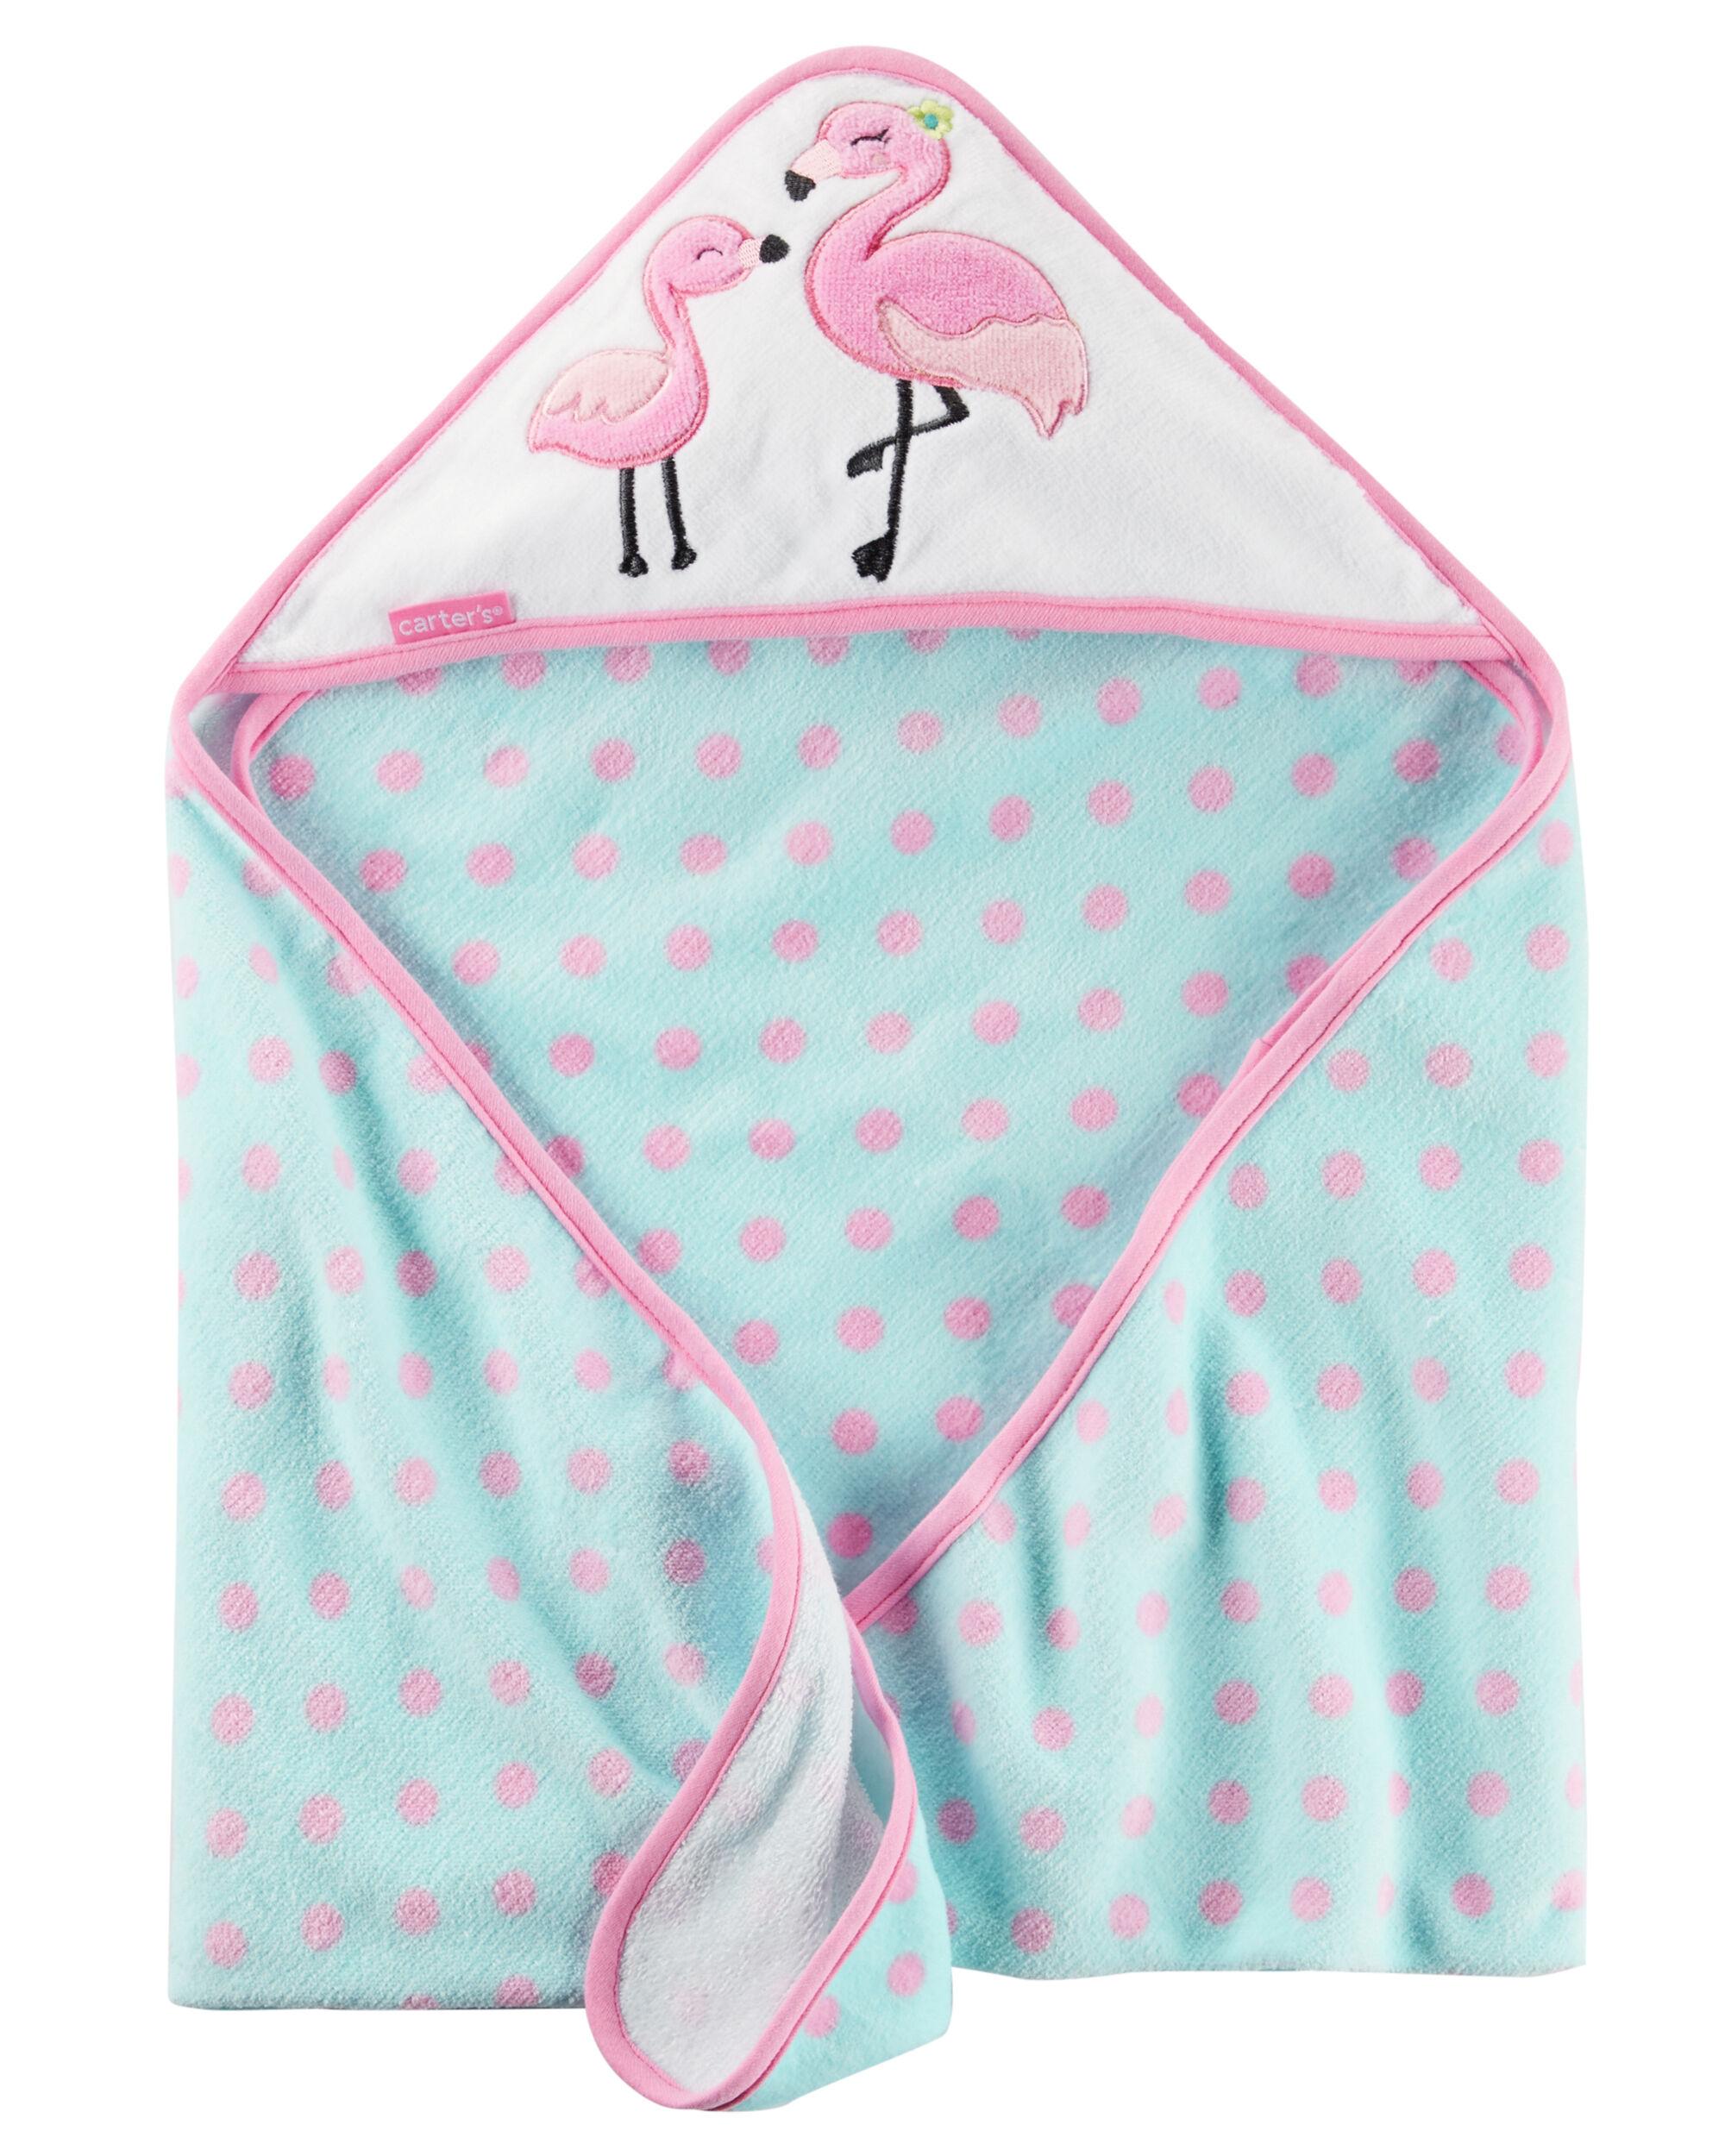 Flamingo Hooded Towel Carters Com